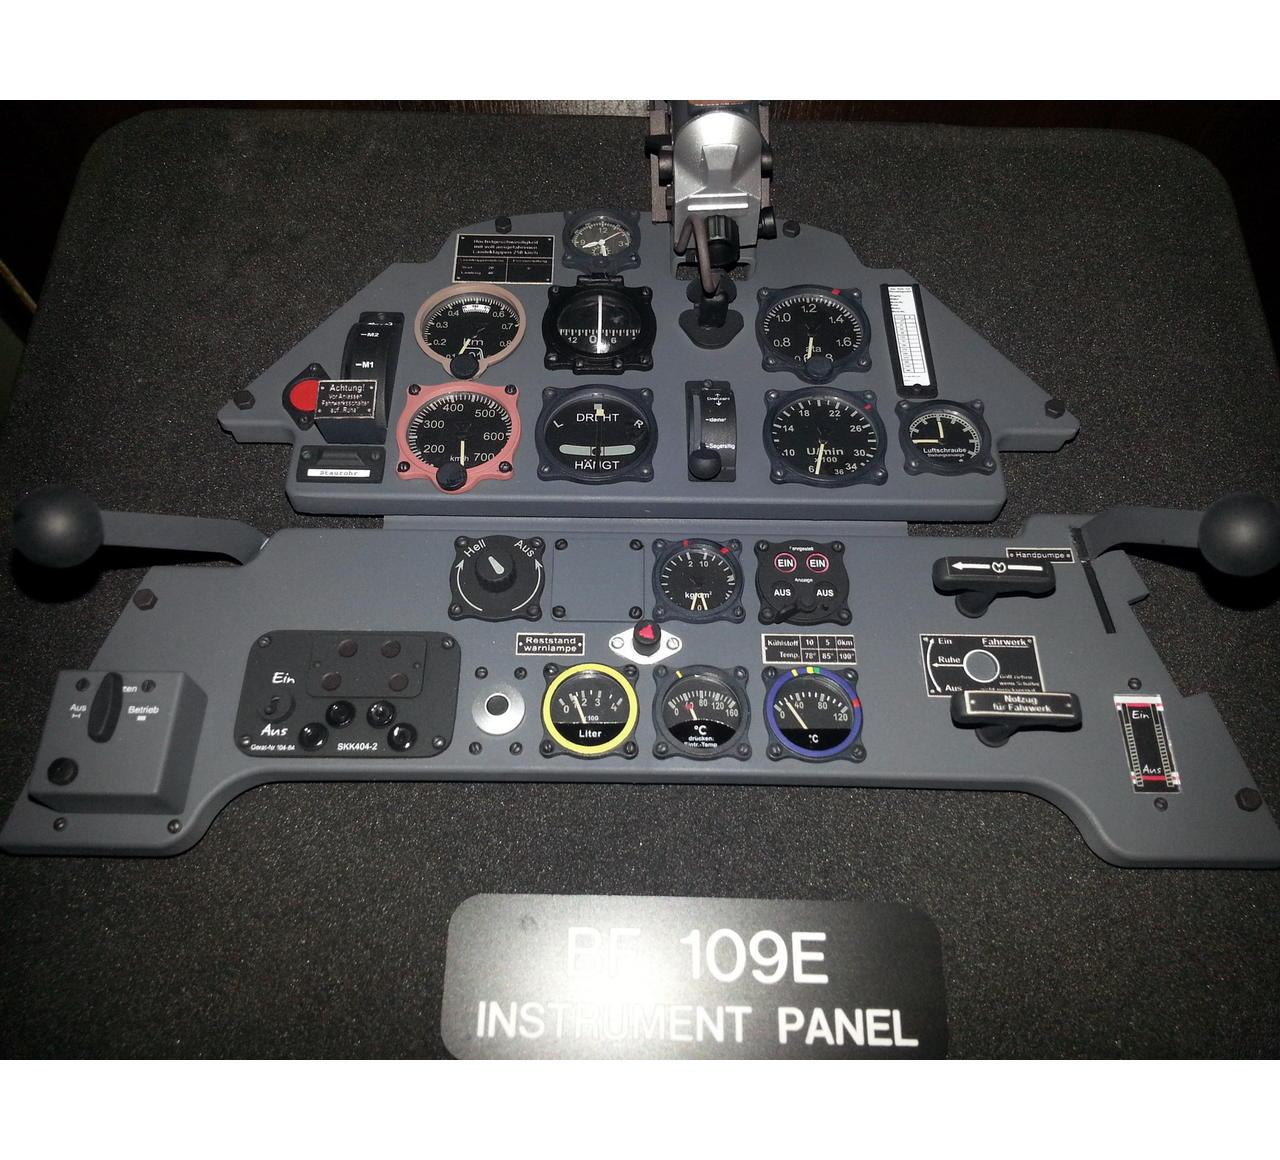 Bf-109E instrument panel